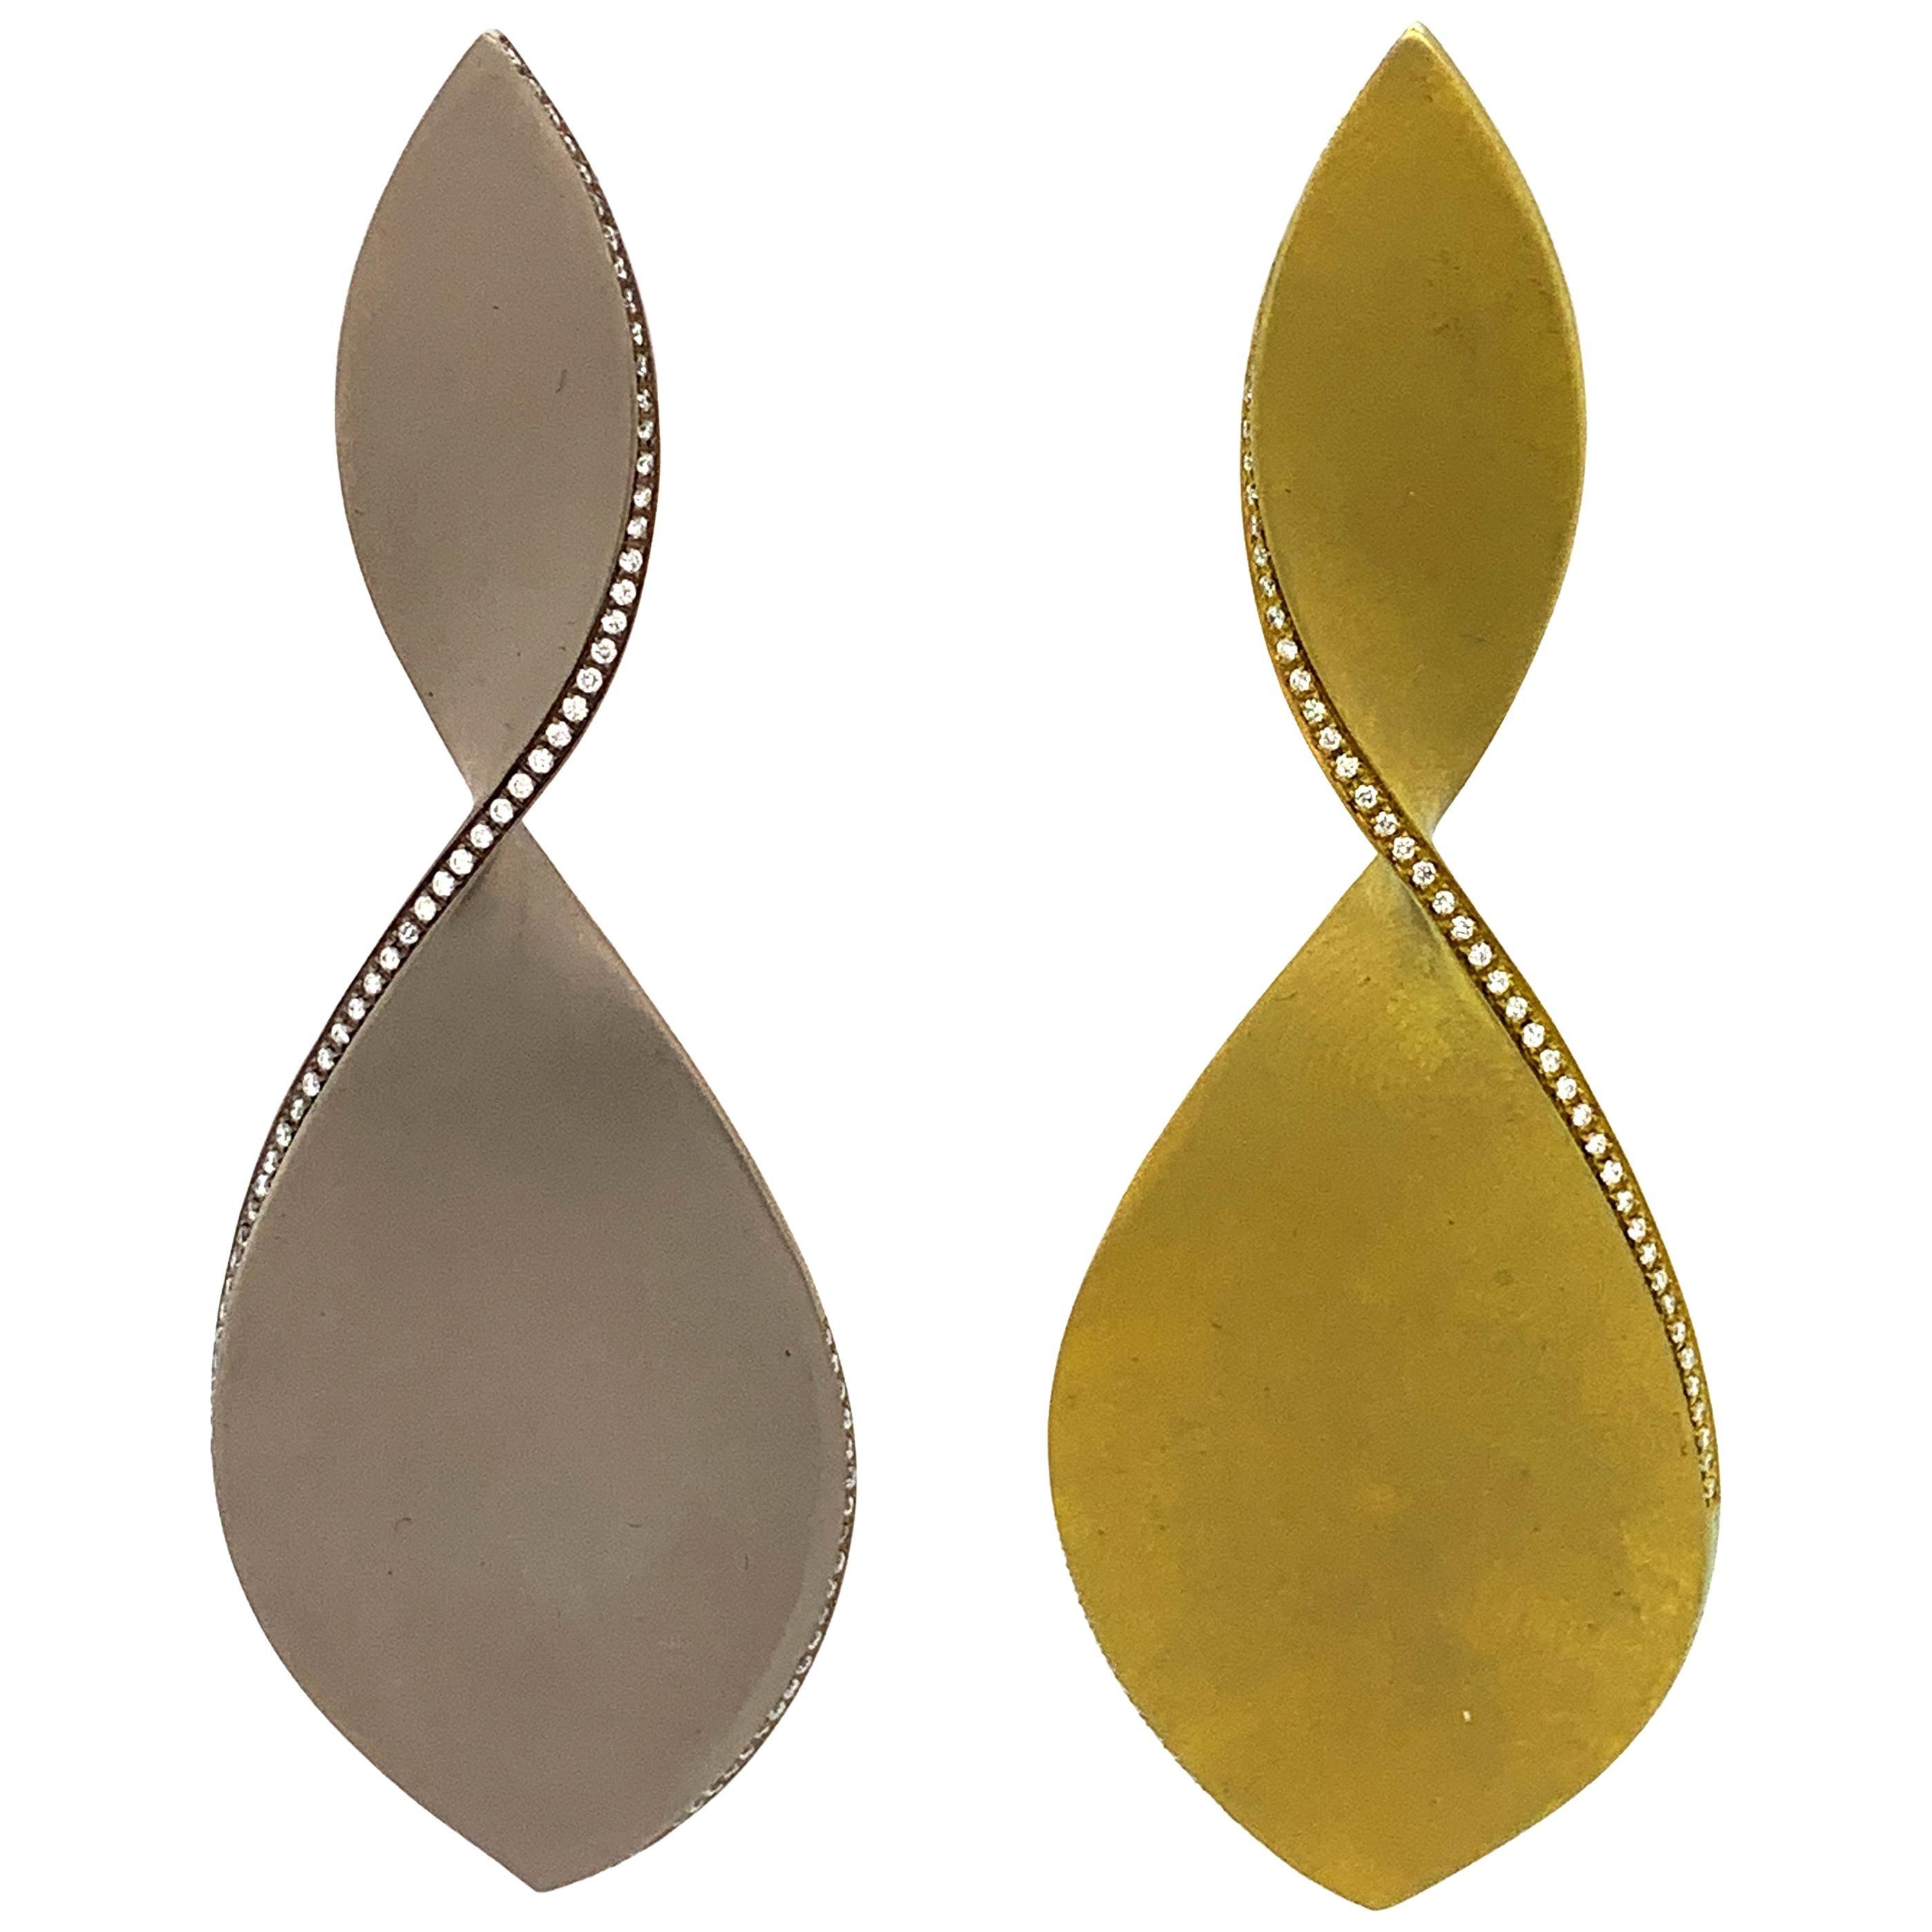 Titanium and Diamonds Twist Earrings